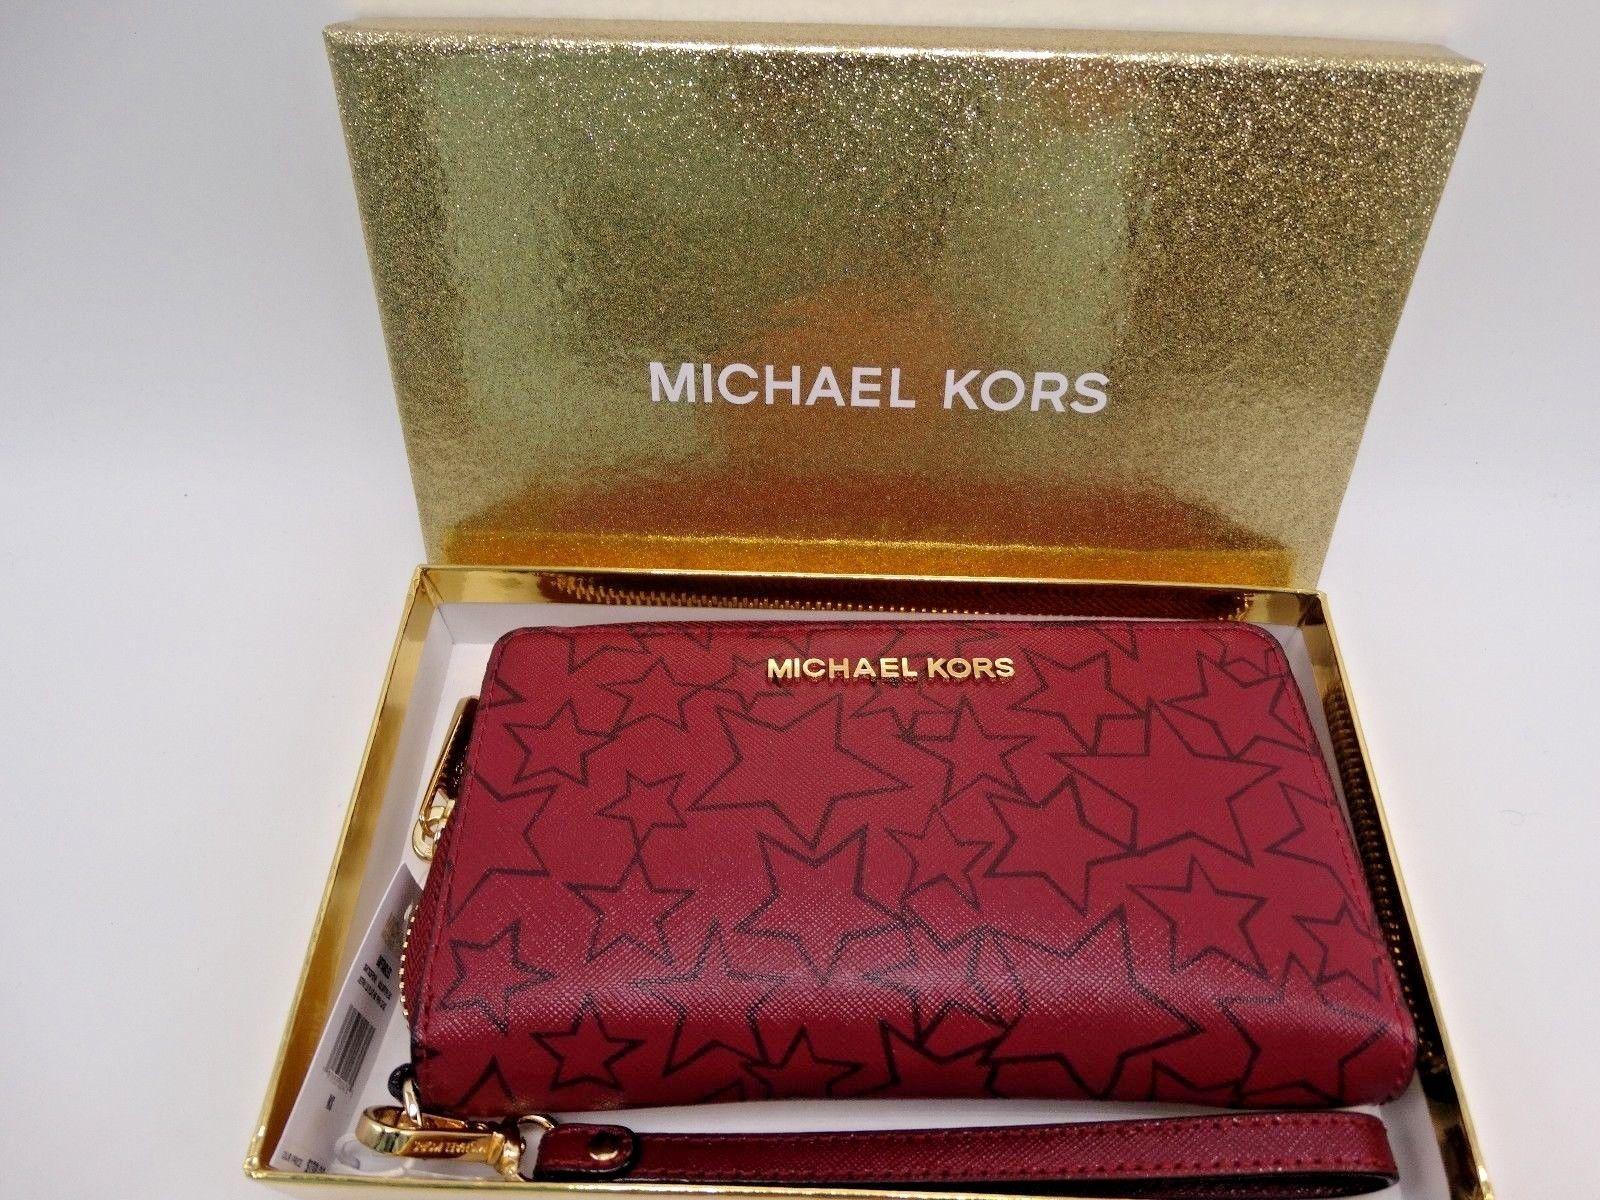 da80354dad5ec Phone Case Wristlet Michael Kors Jet set and 50 similar items